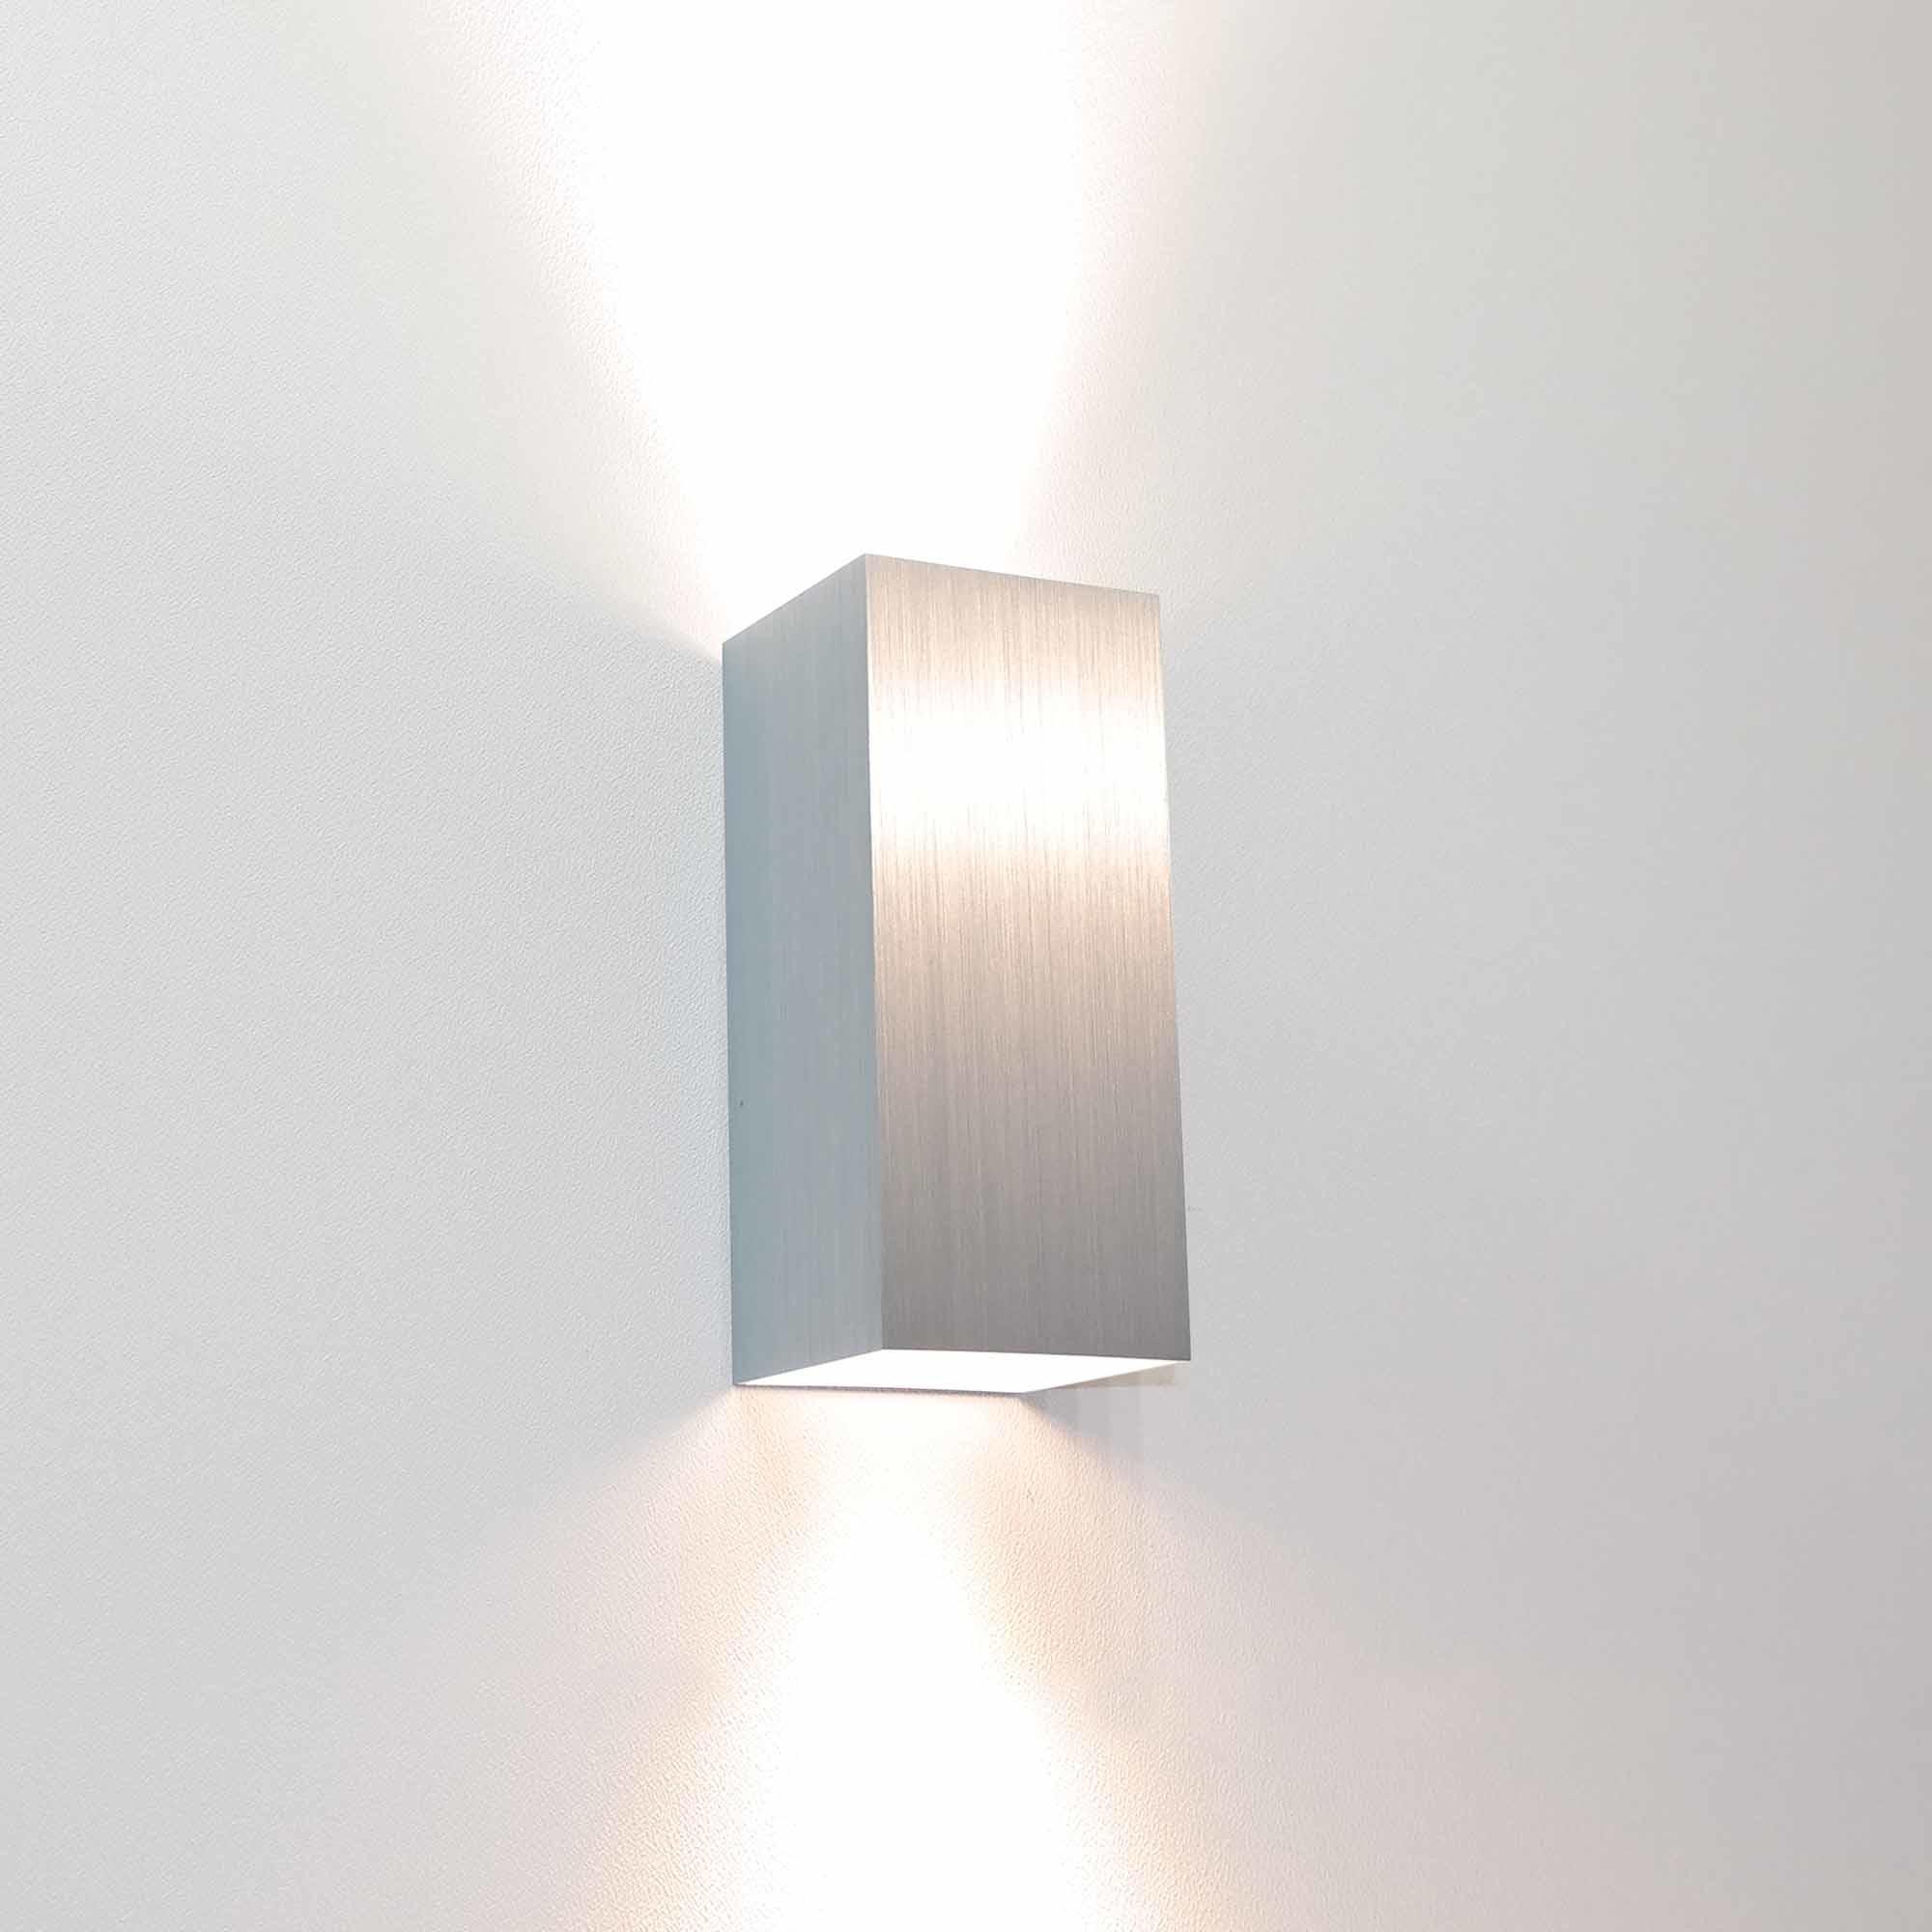 Artdelight Wandlamp Dante 2 lichts 15,5 x 6,5 cm aluminium